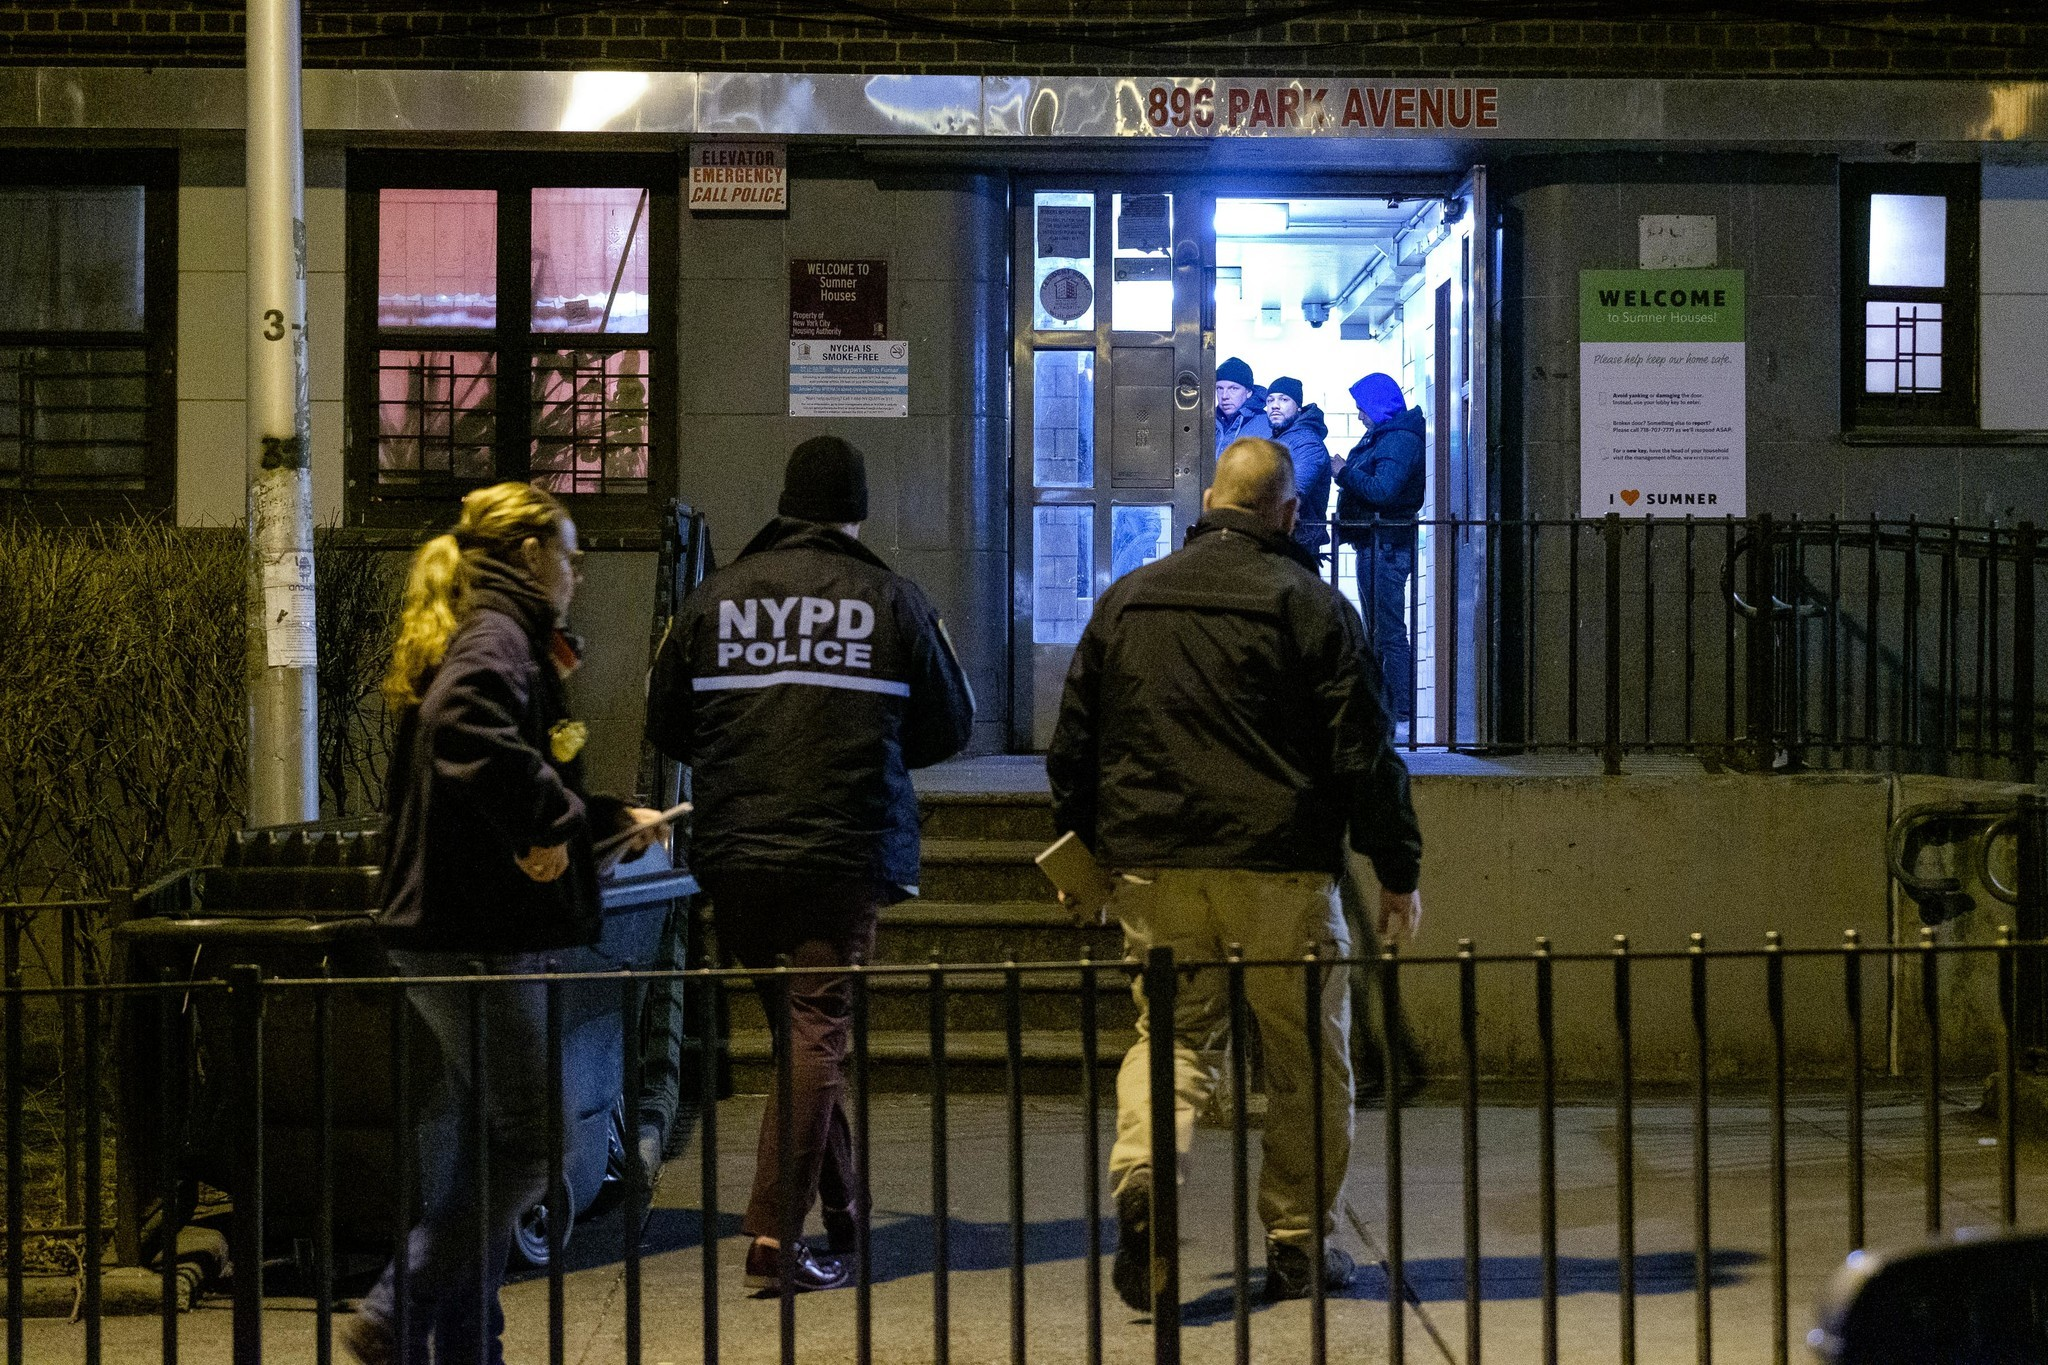 Brooklyn man who fatally shot mom took photos of her dead body: prosecutors